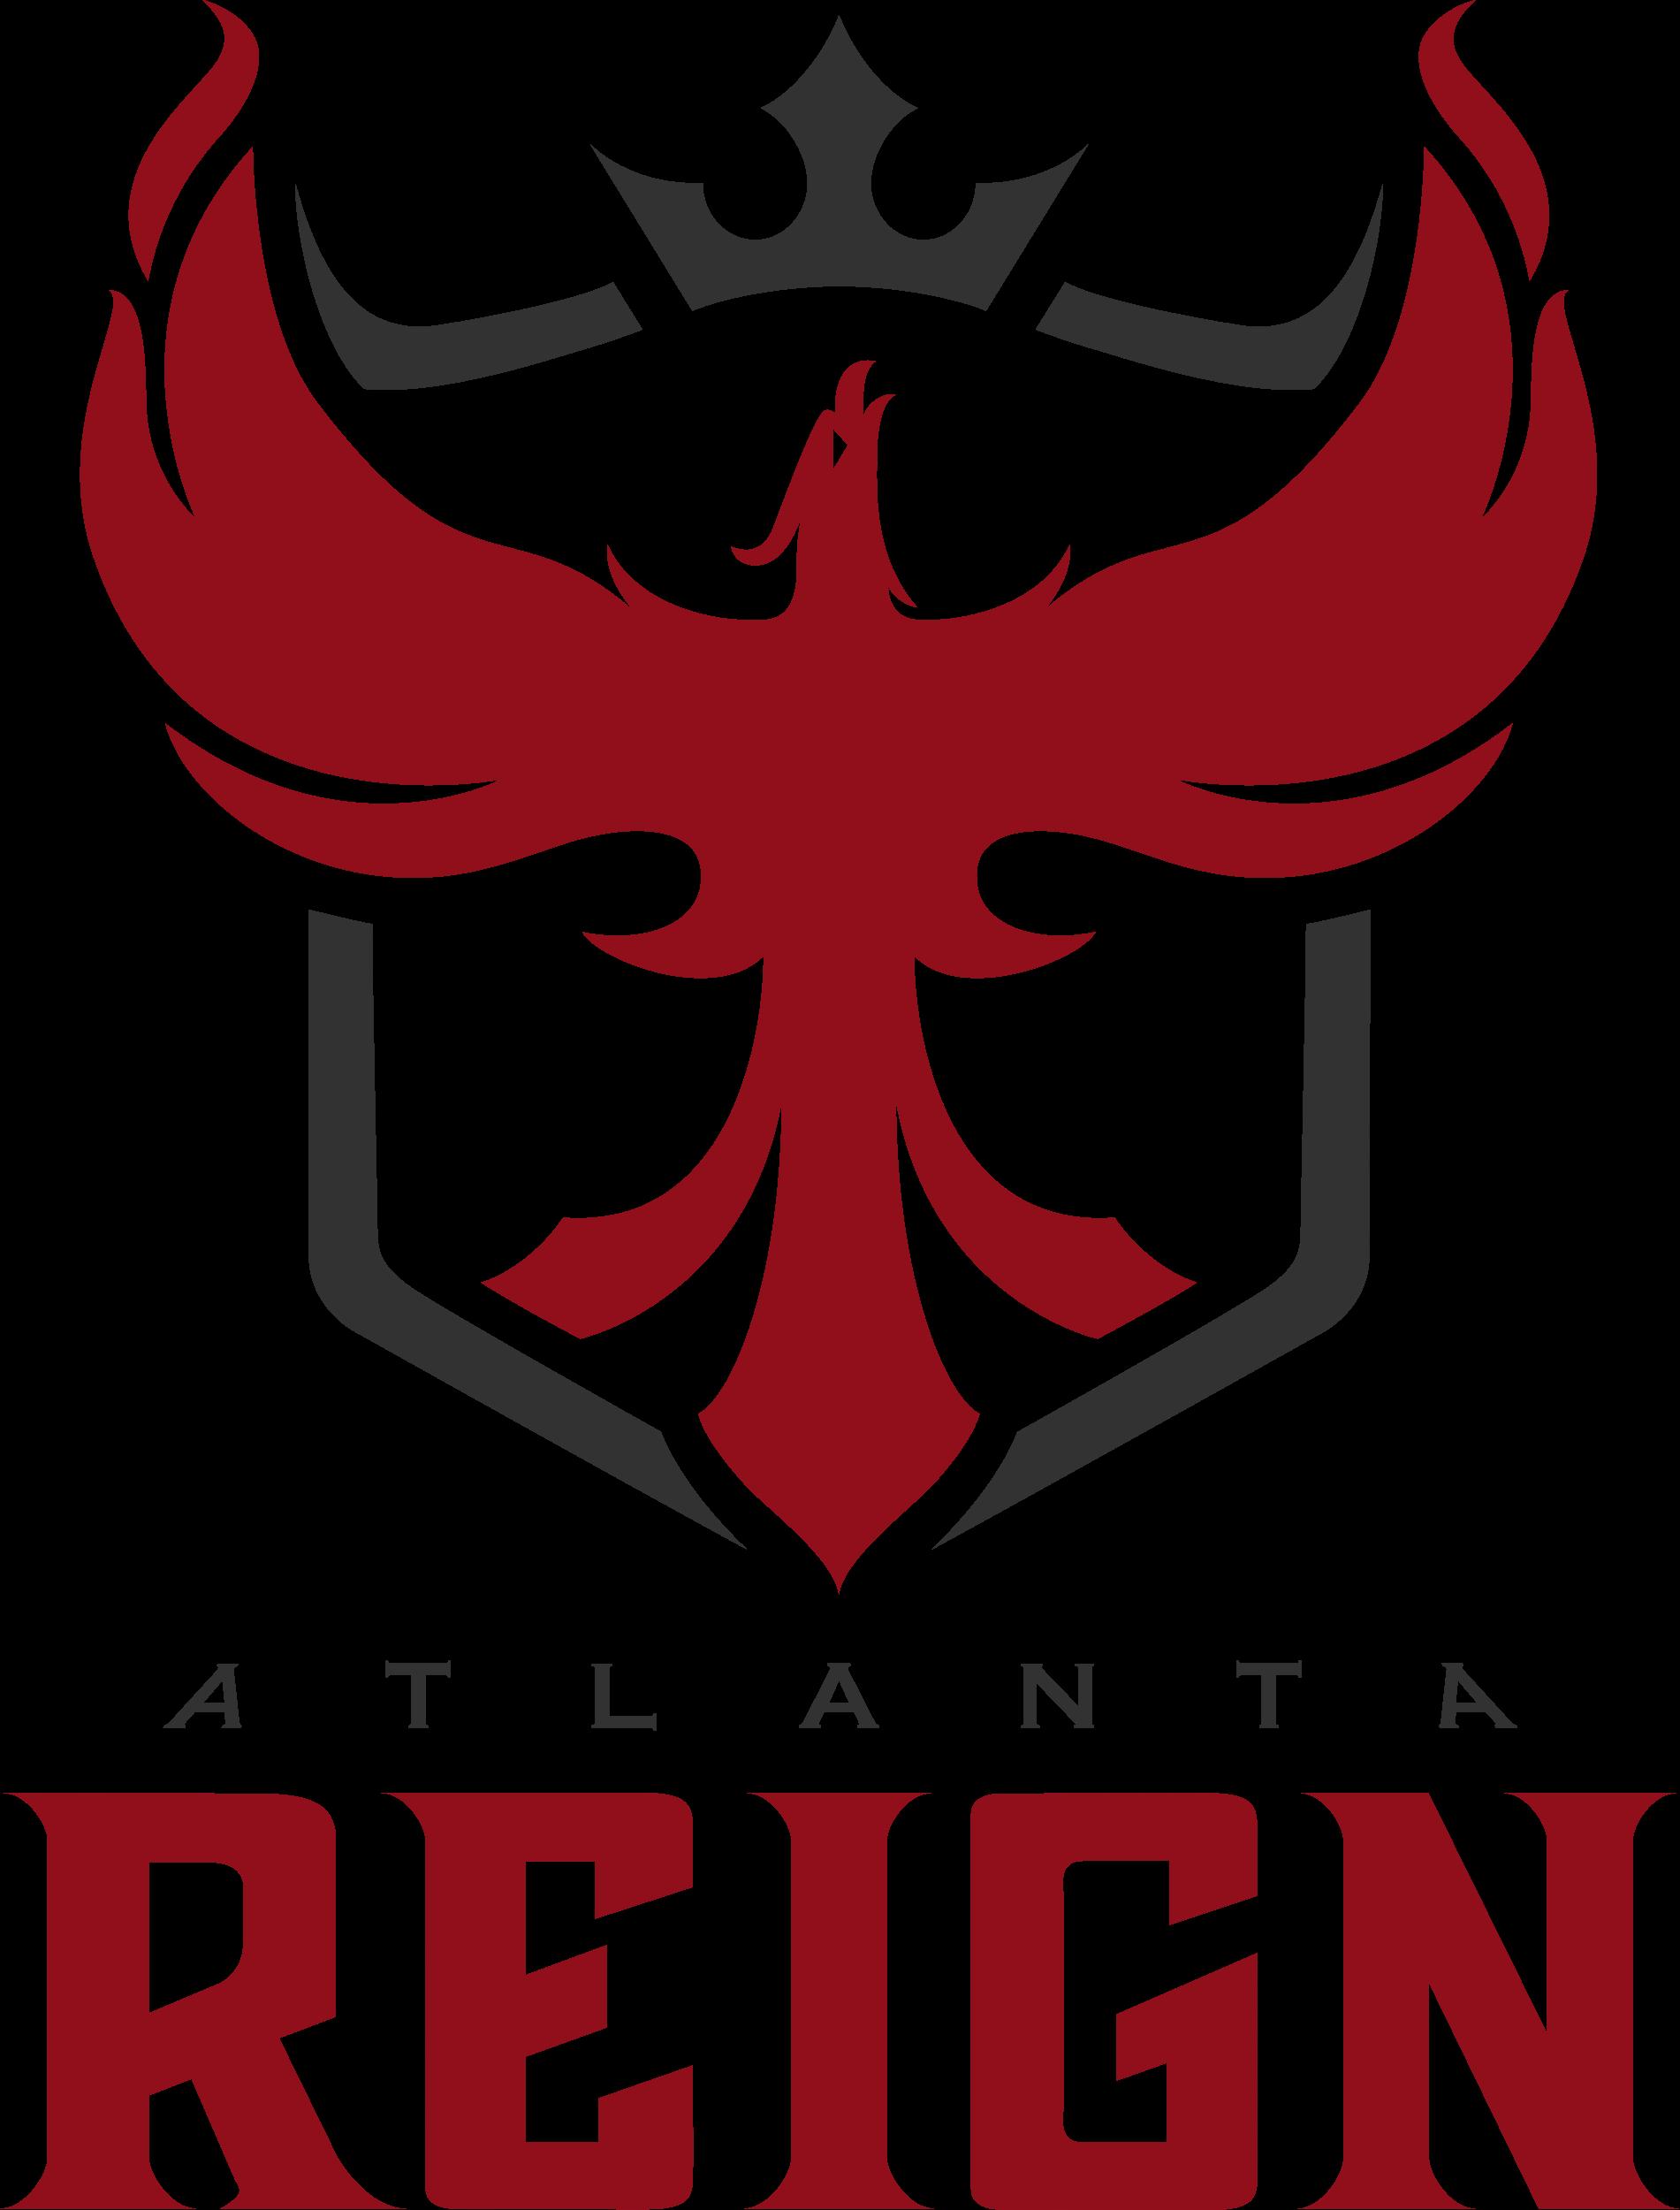 Atlanta Reign Overwatch Team Logo